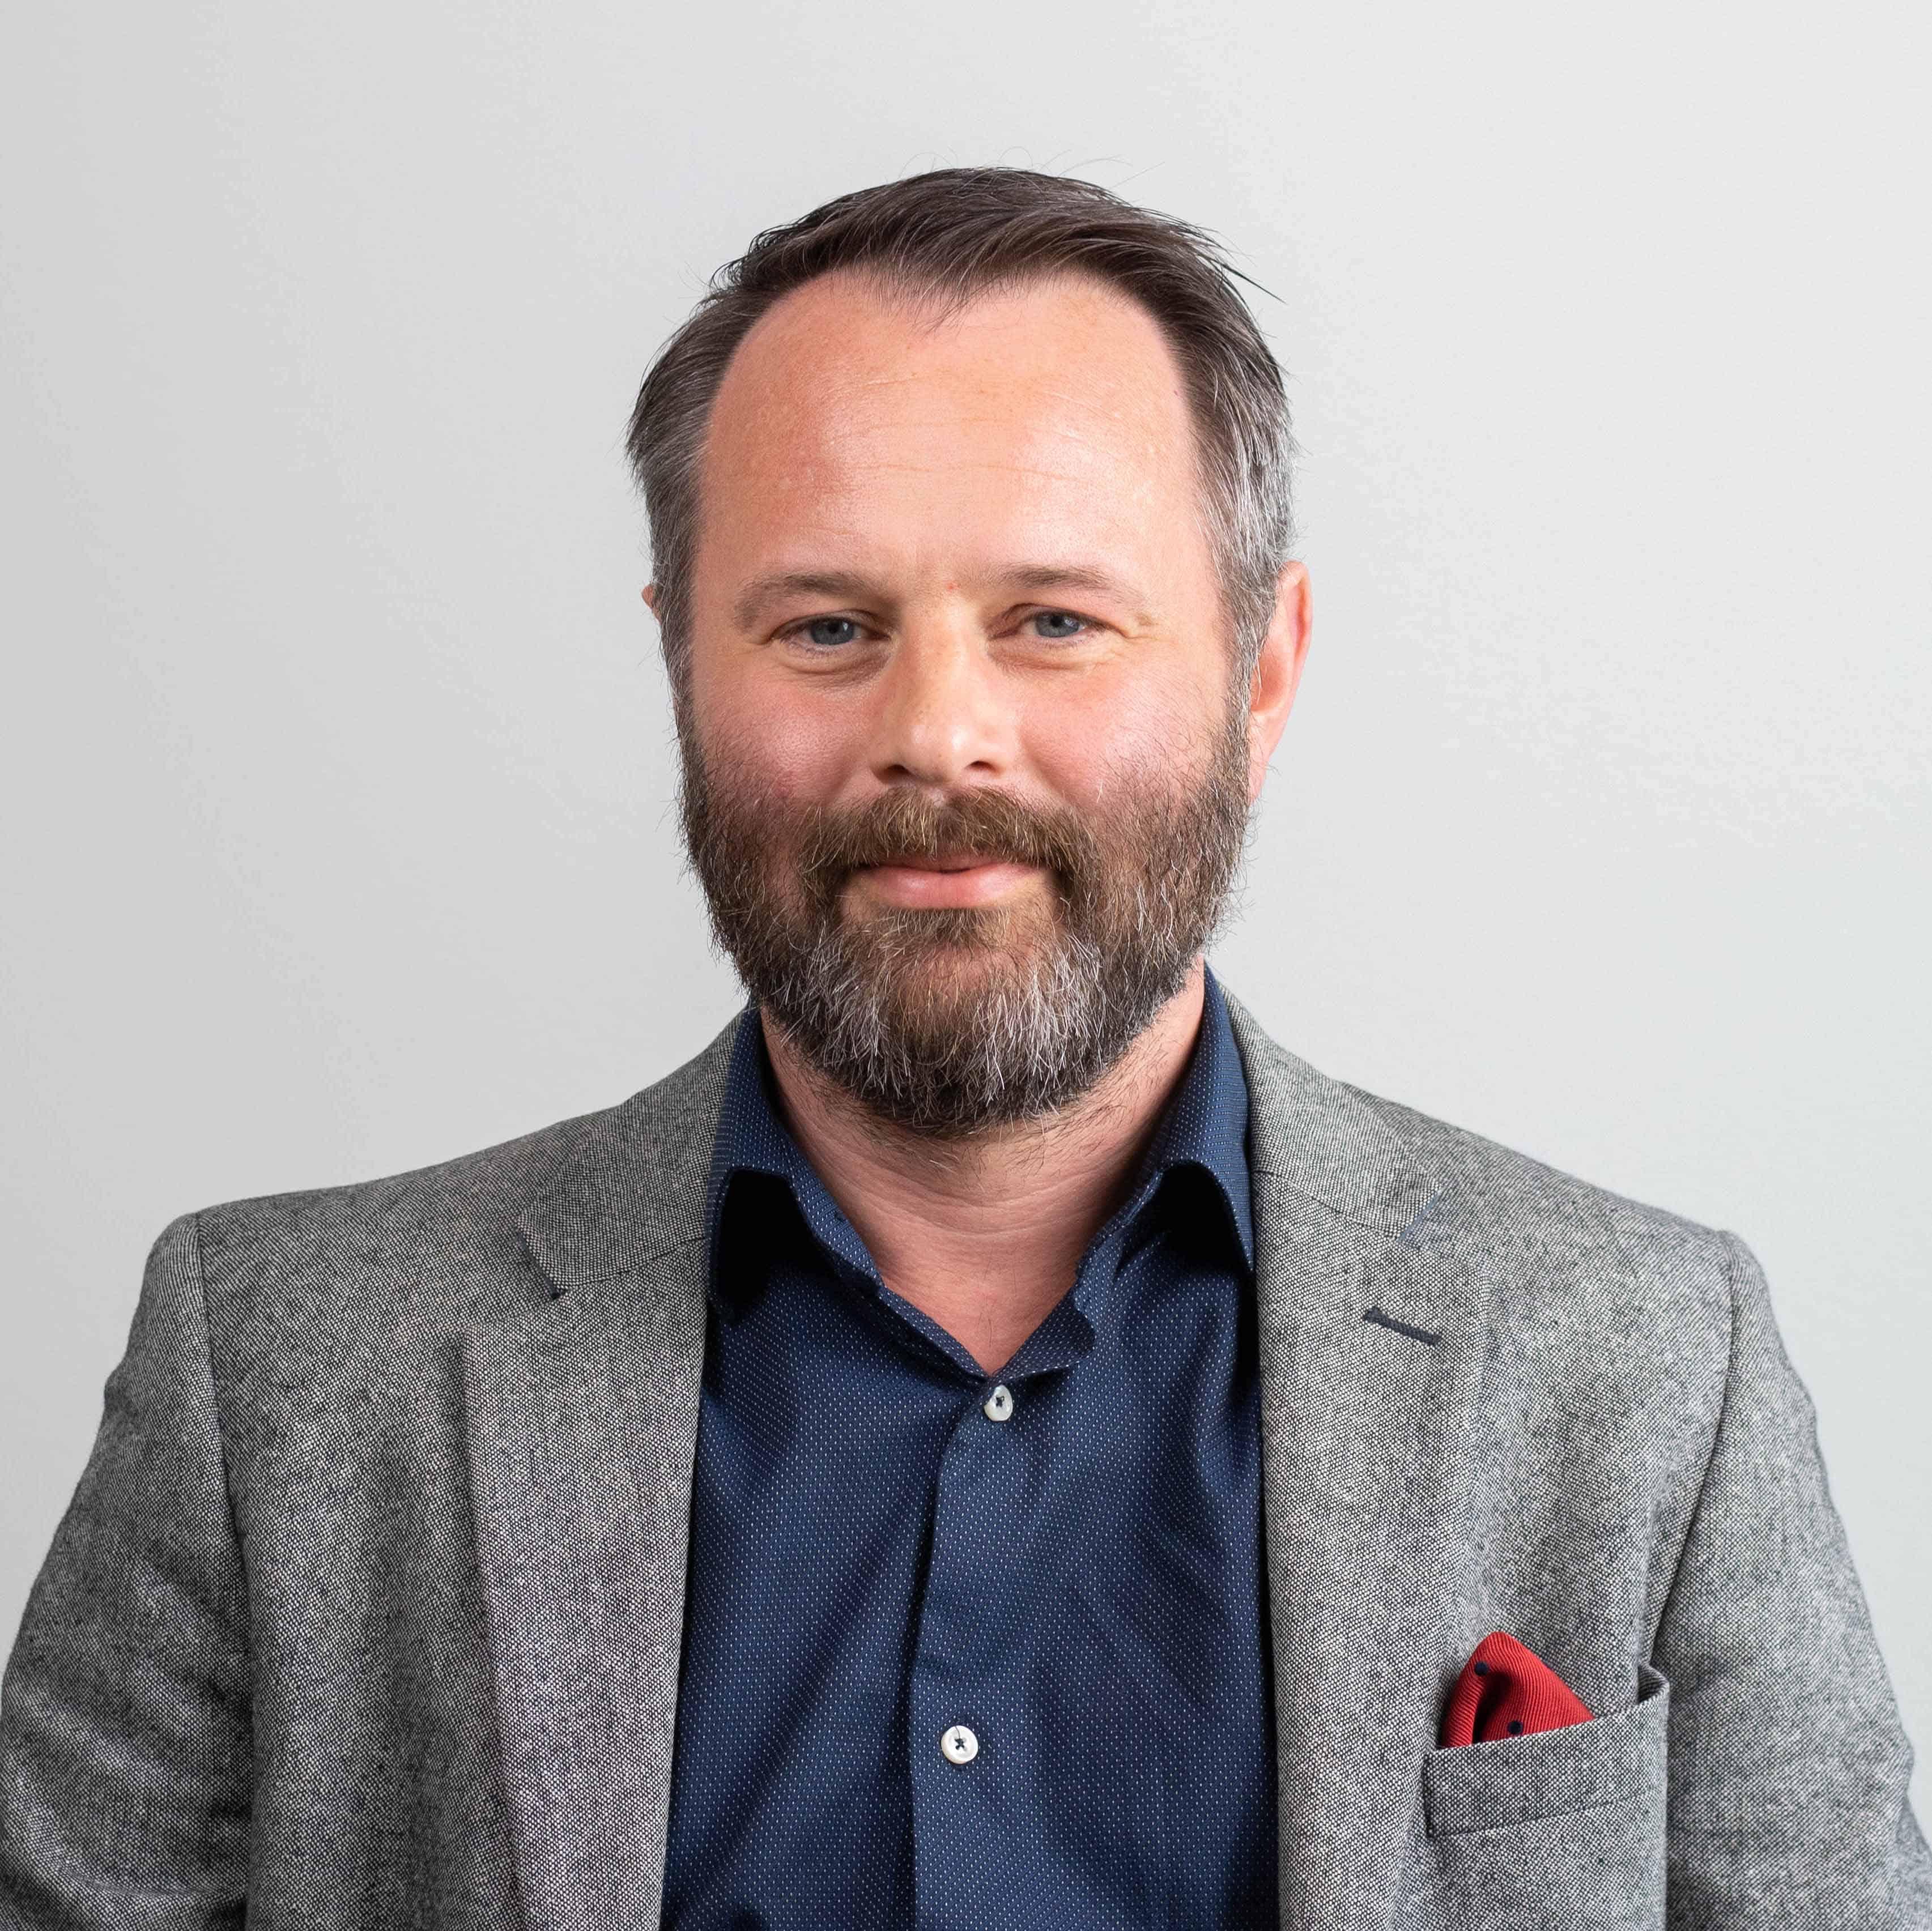 Fredrik Fagrell